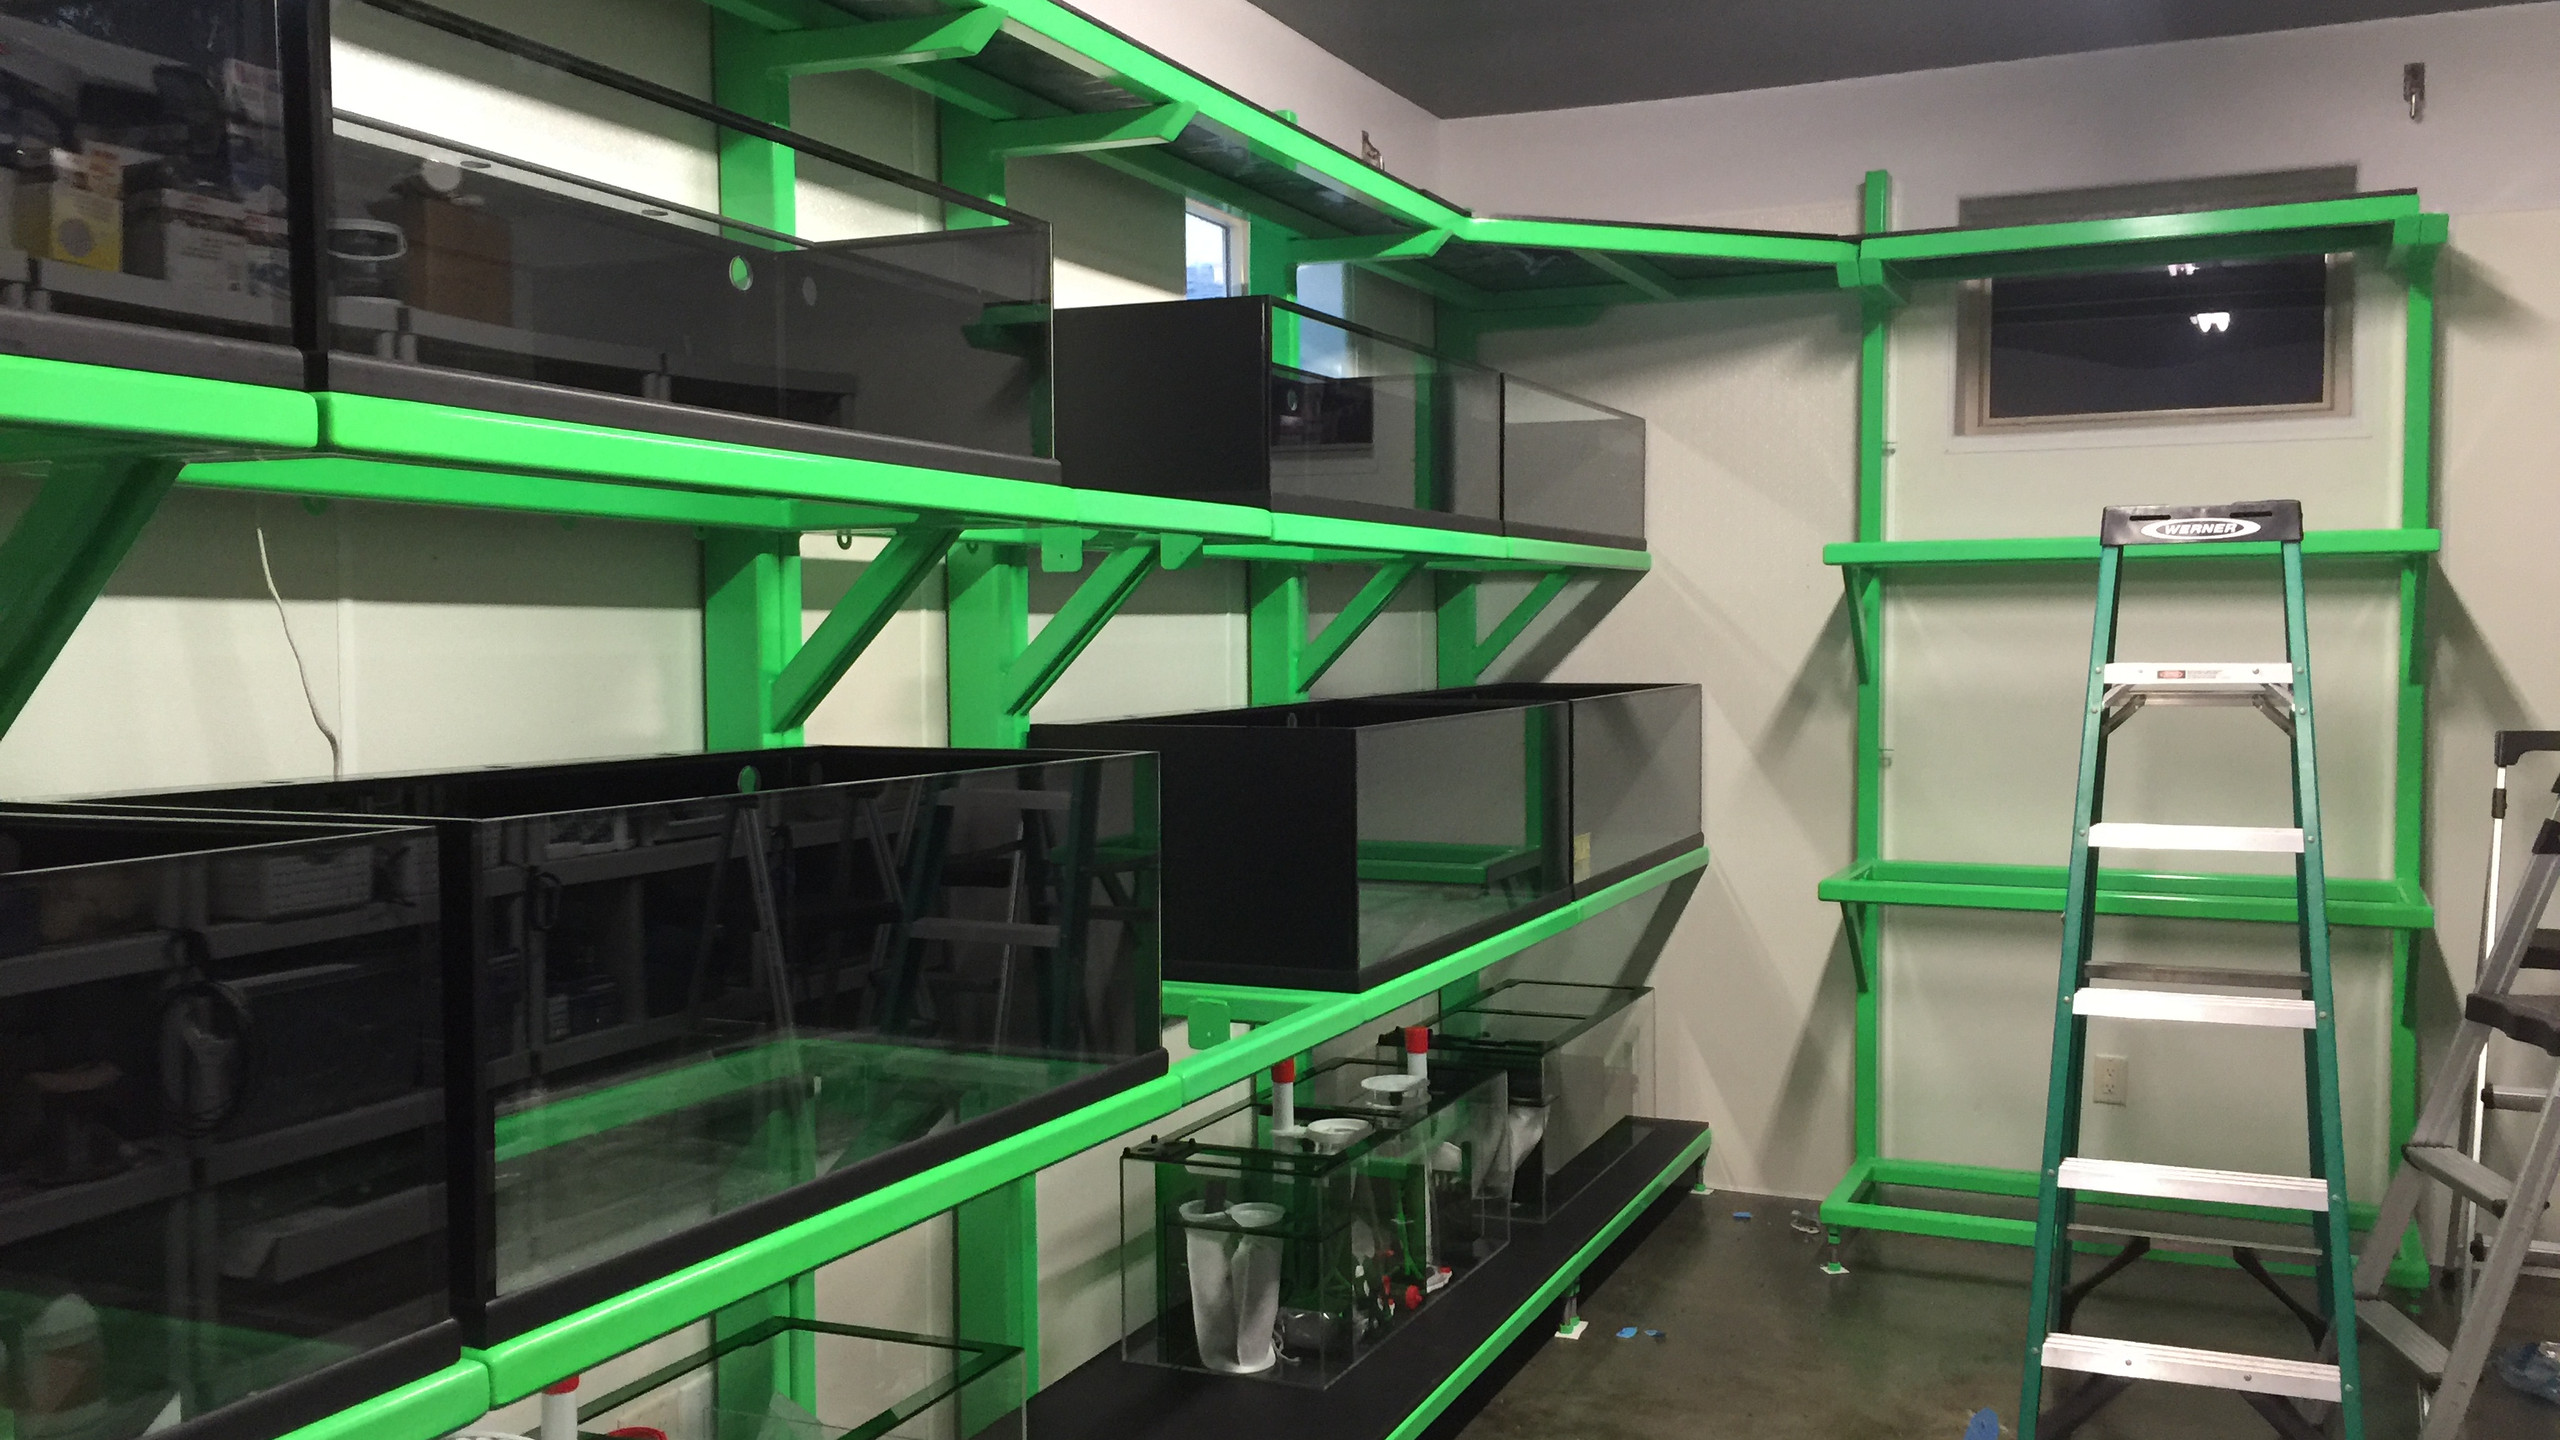 11-New Look of Aquarium Room